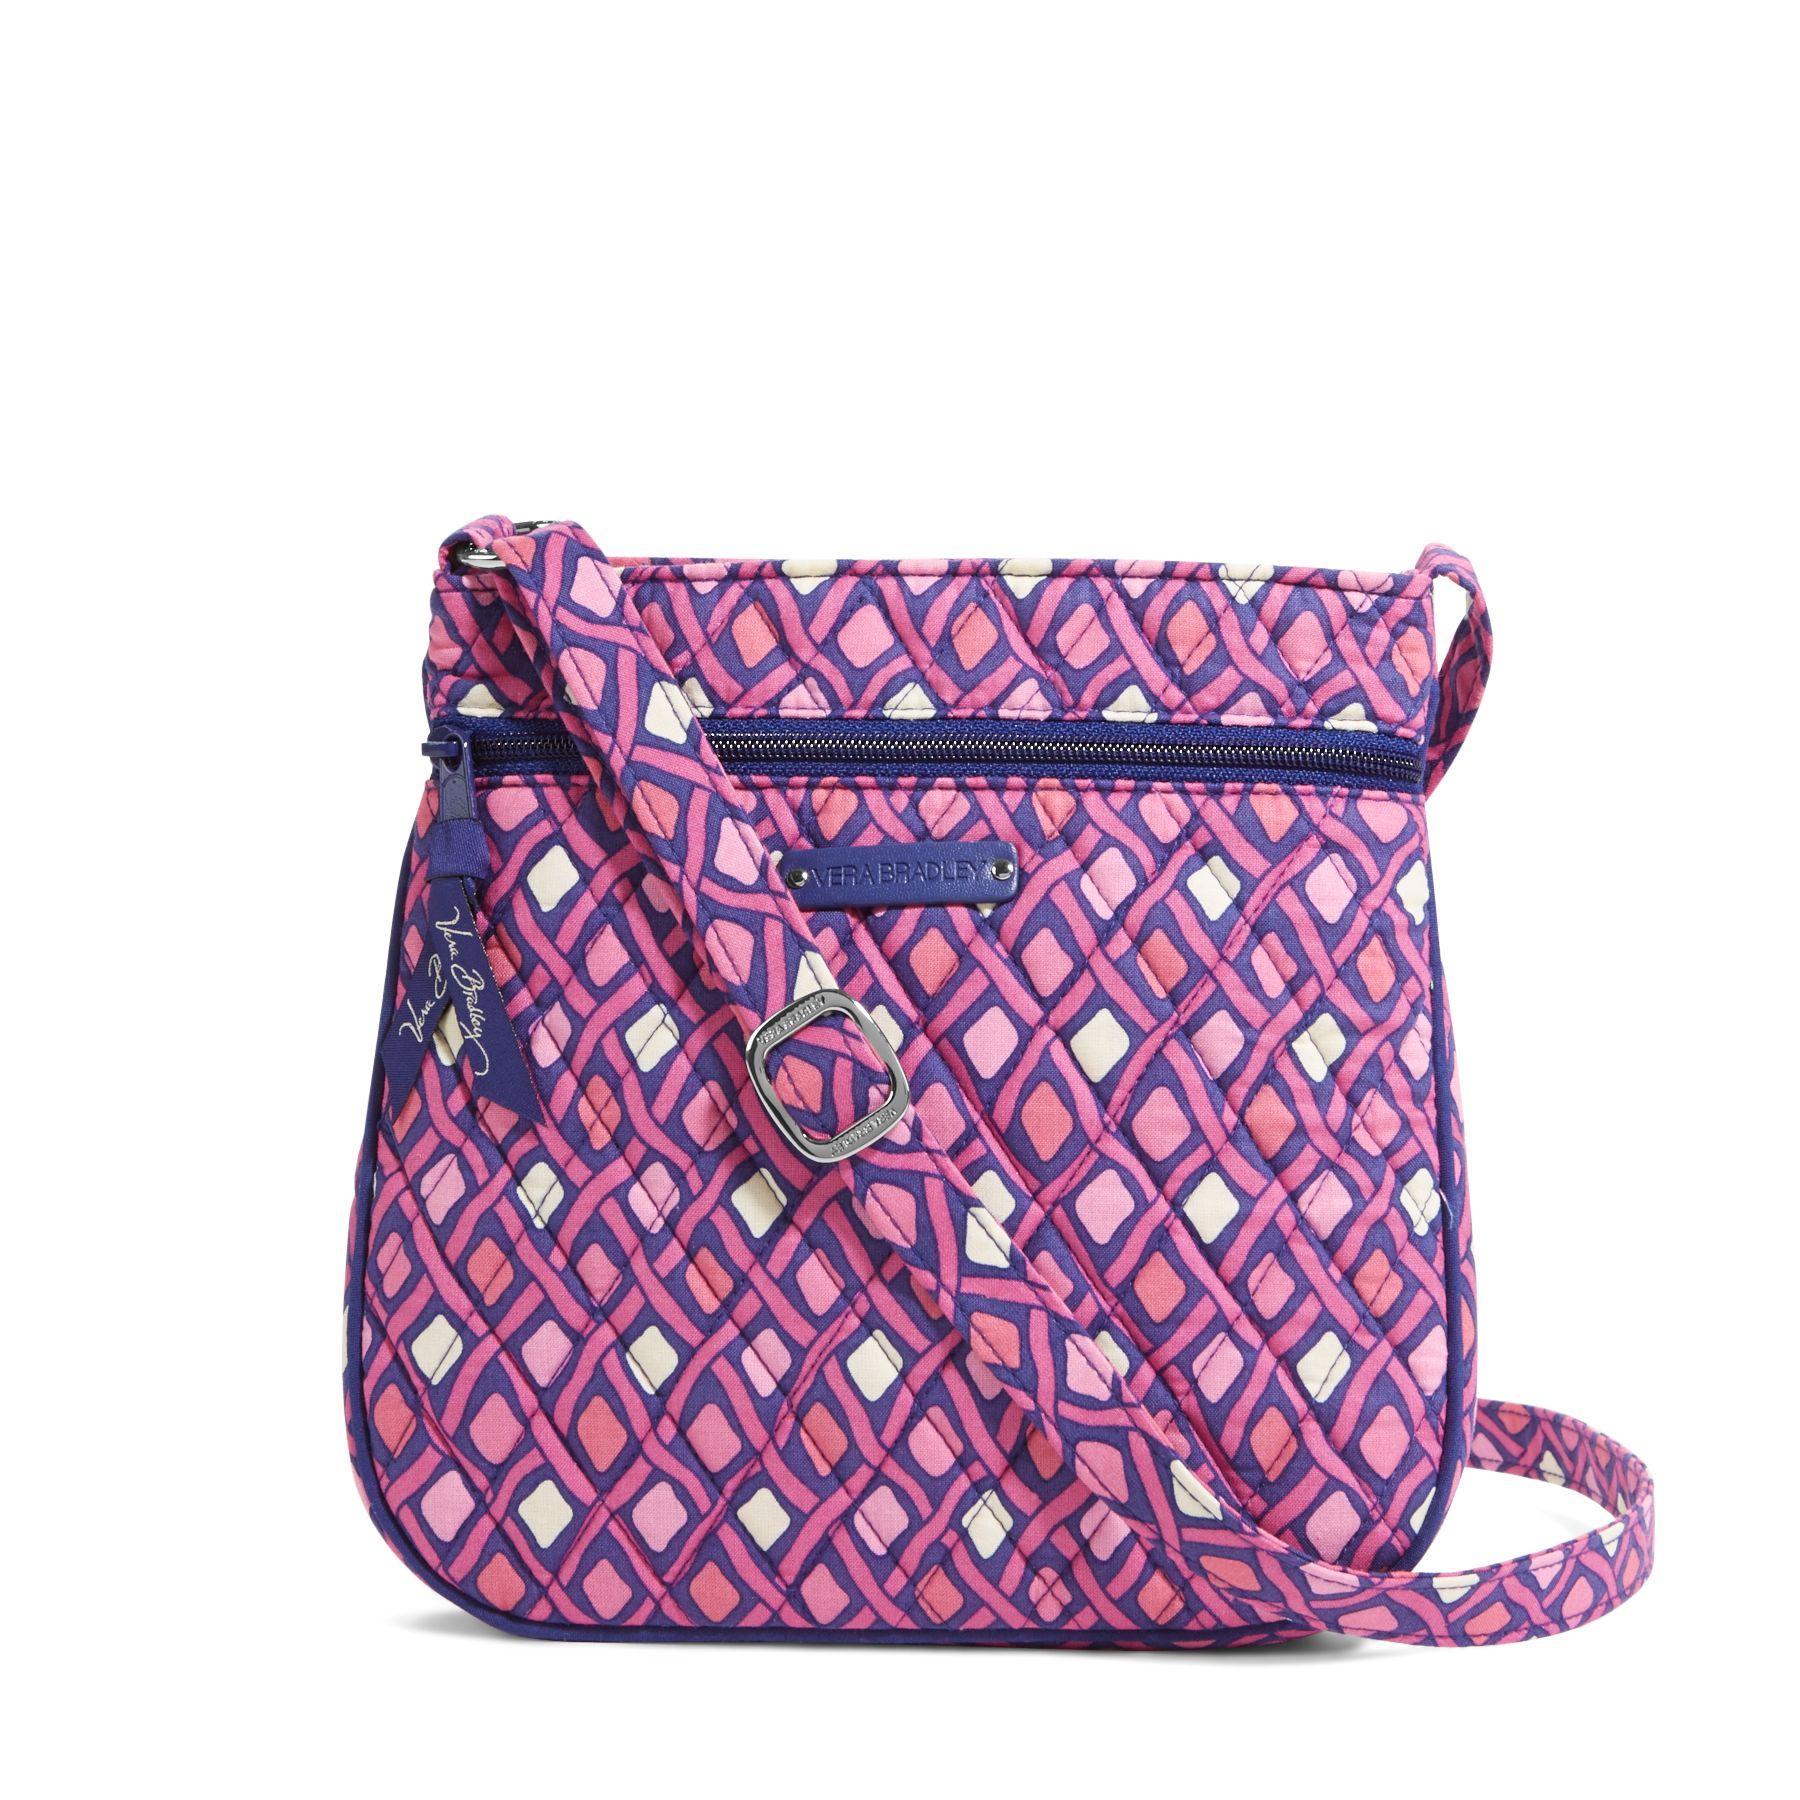 Vera Bradley Petite Double Zip Hipster Crossbody Bag $16